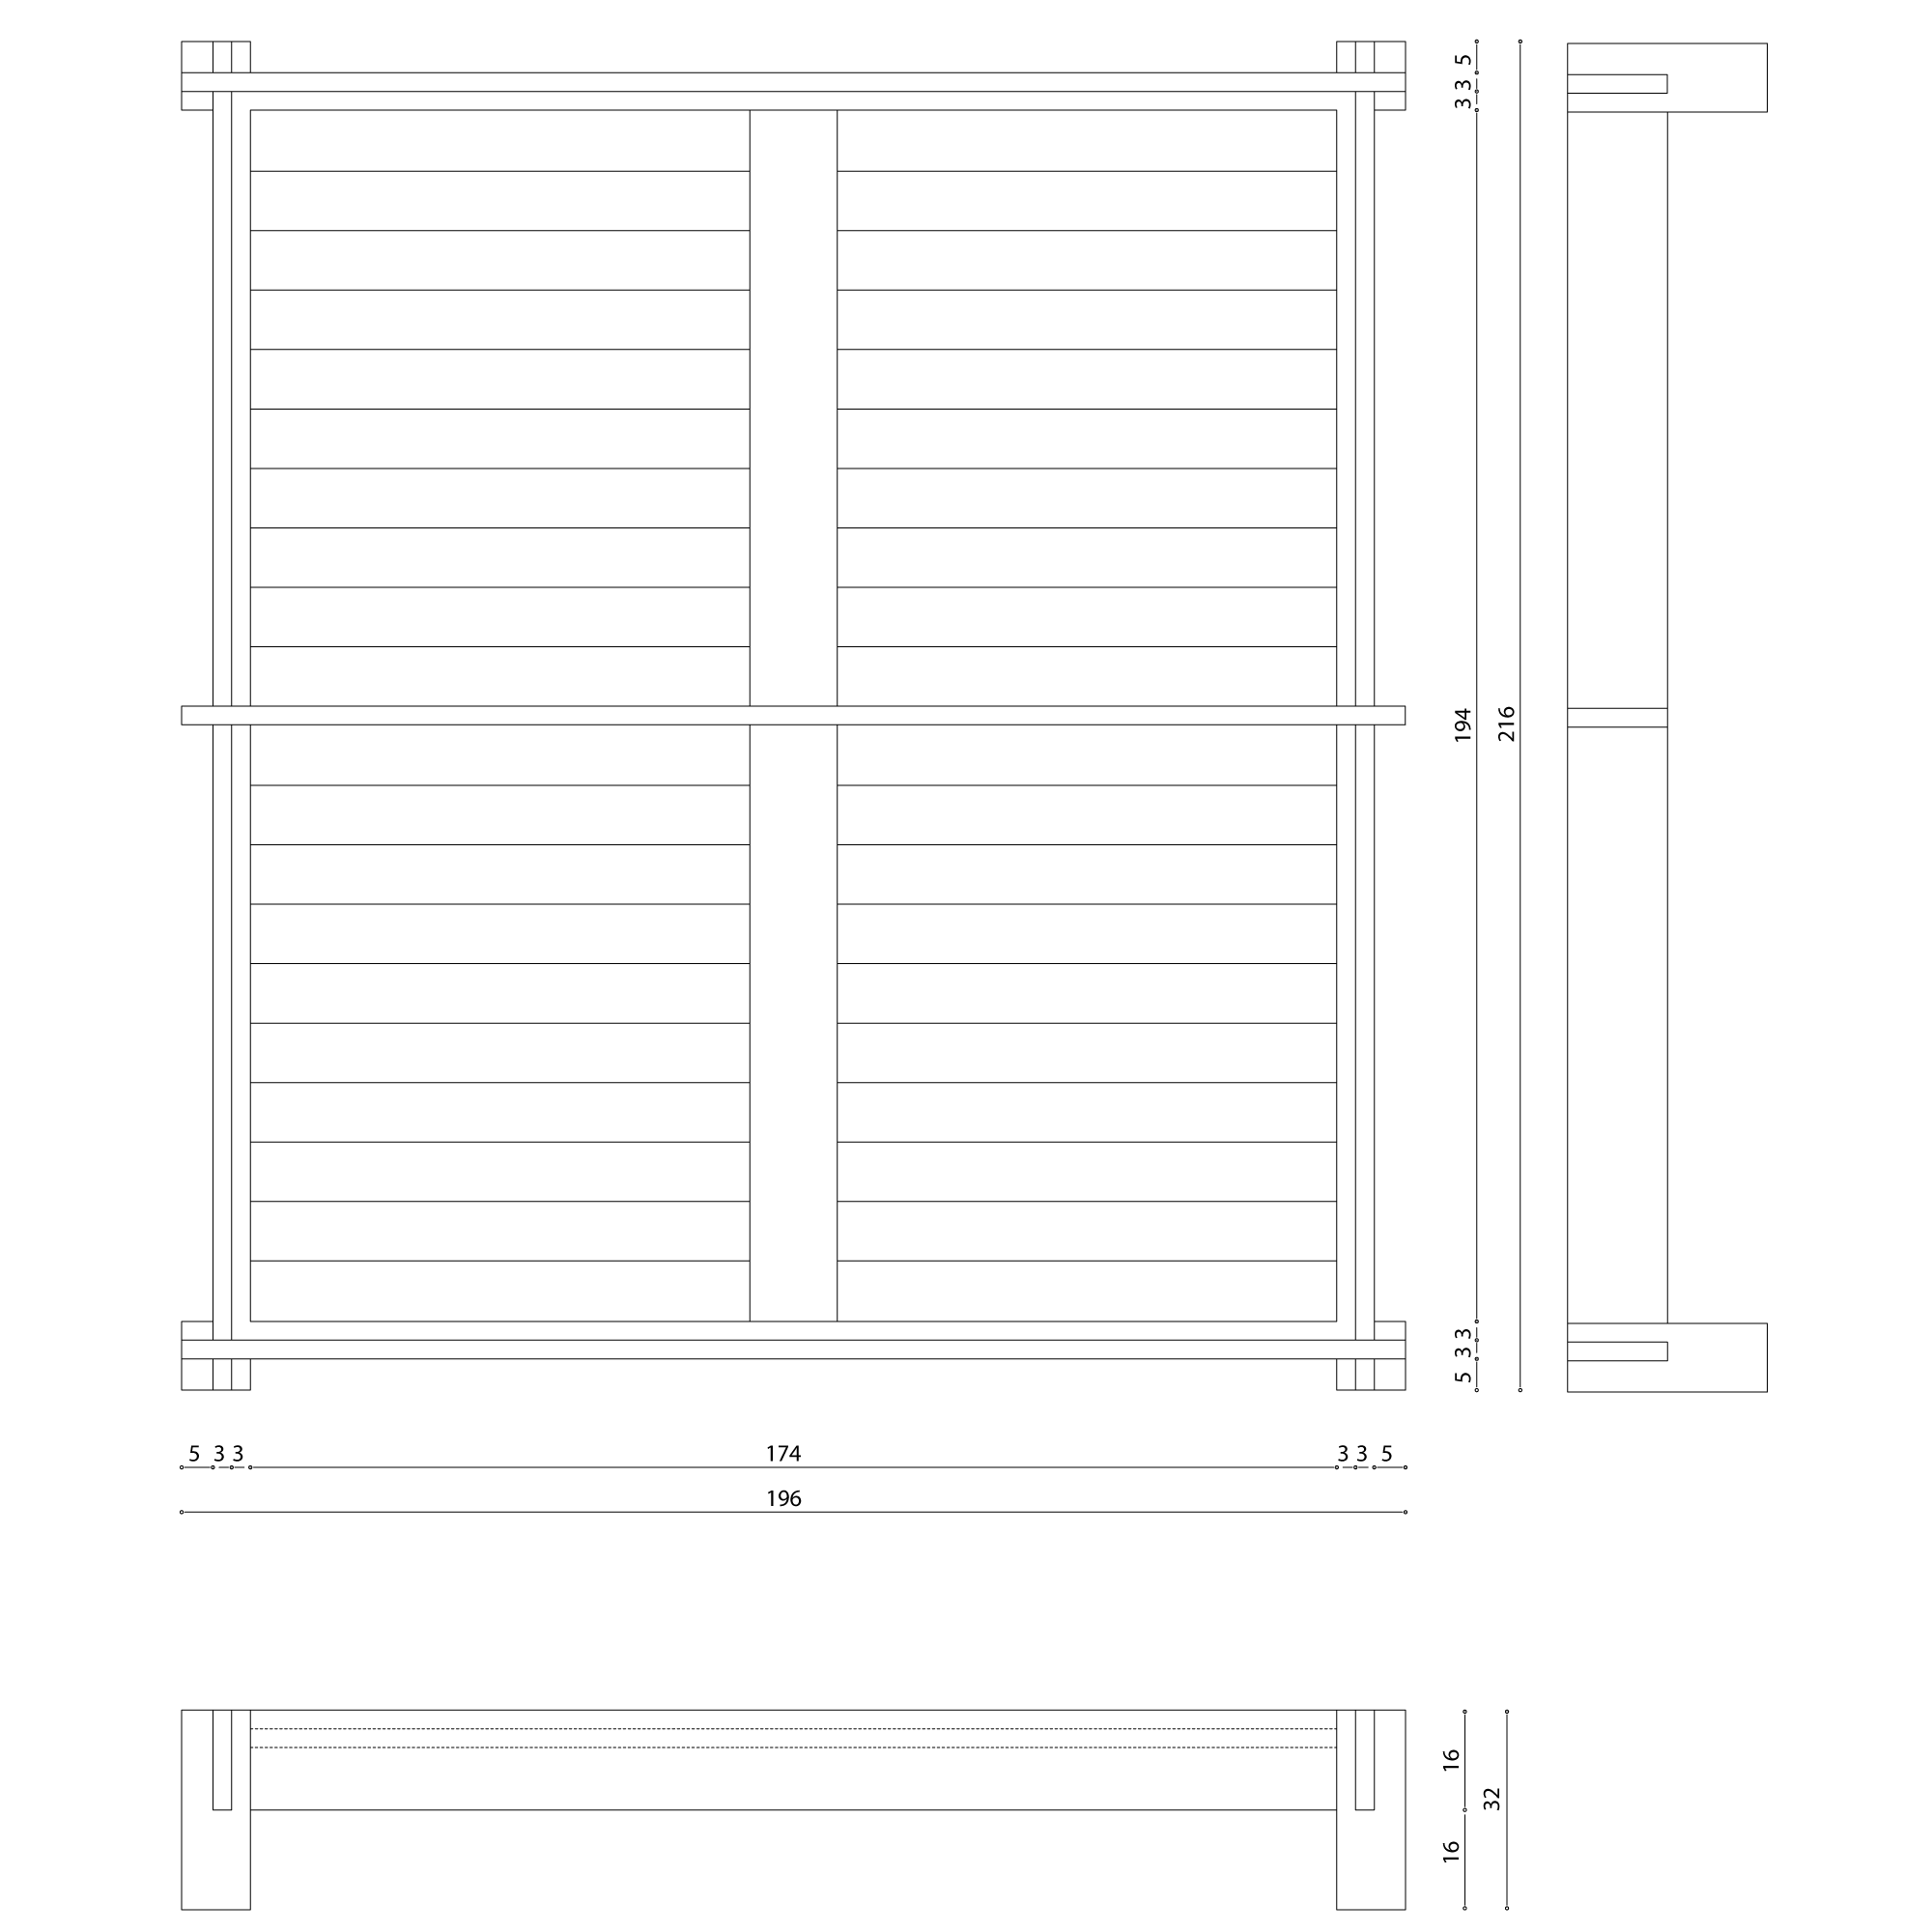 Scheda-tecnica.png (2000×2000)   침대   Pinterest   Camas